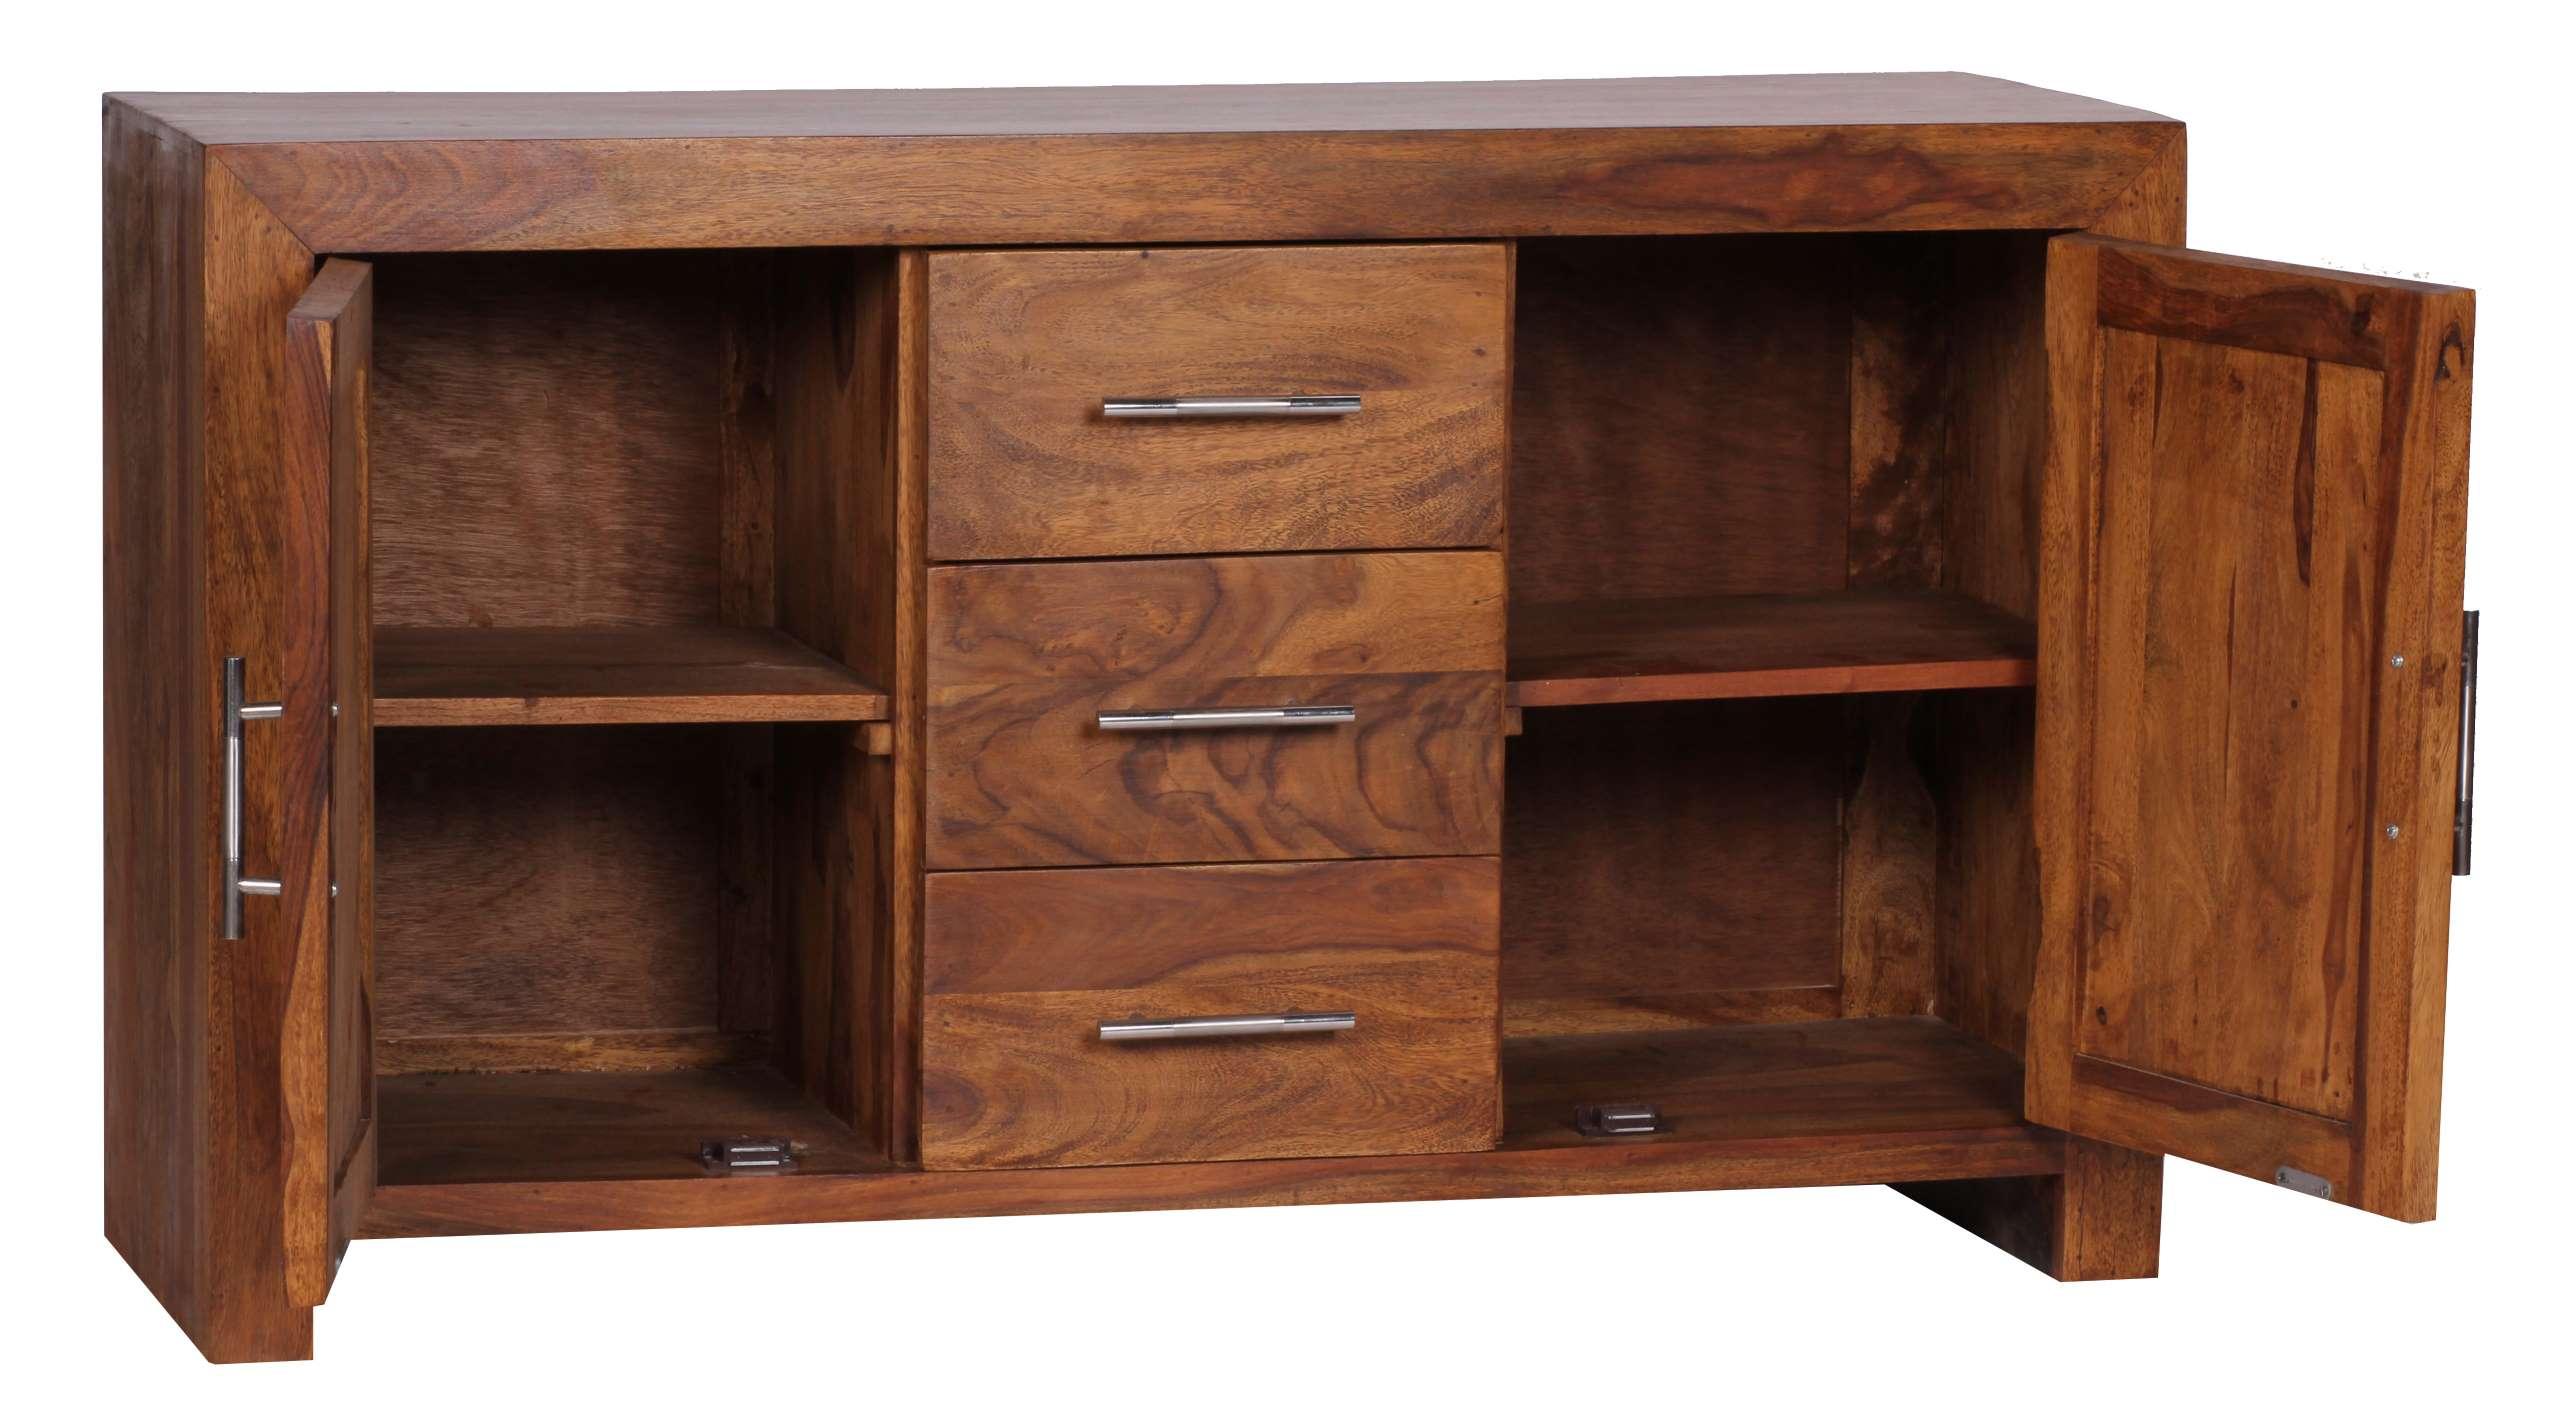 kommode malatya schrank sideboard sheesham massivholz. Black Bedroom Furniture Sets. Home Design Ideas